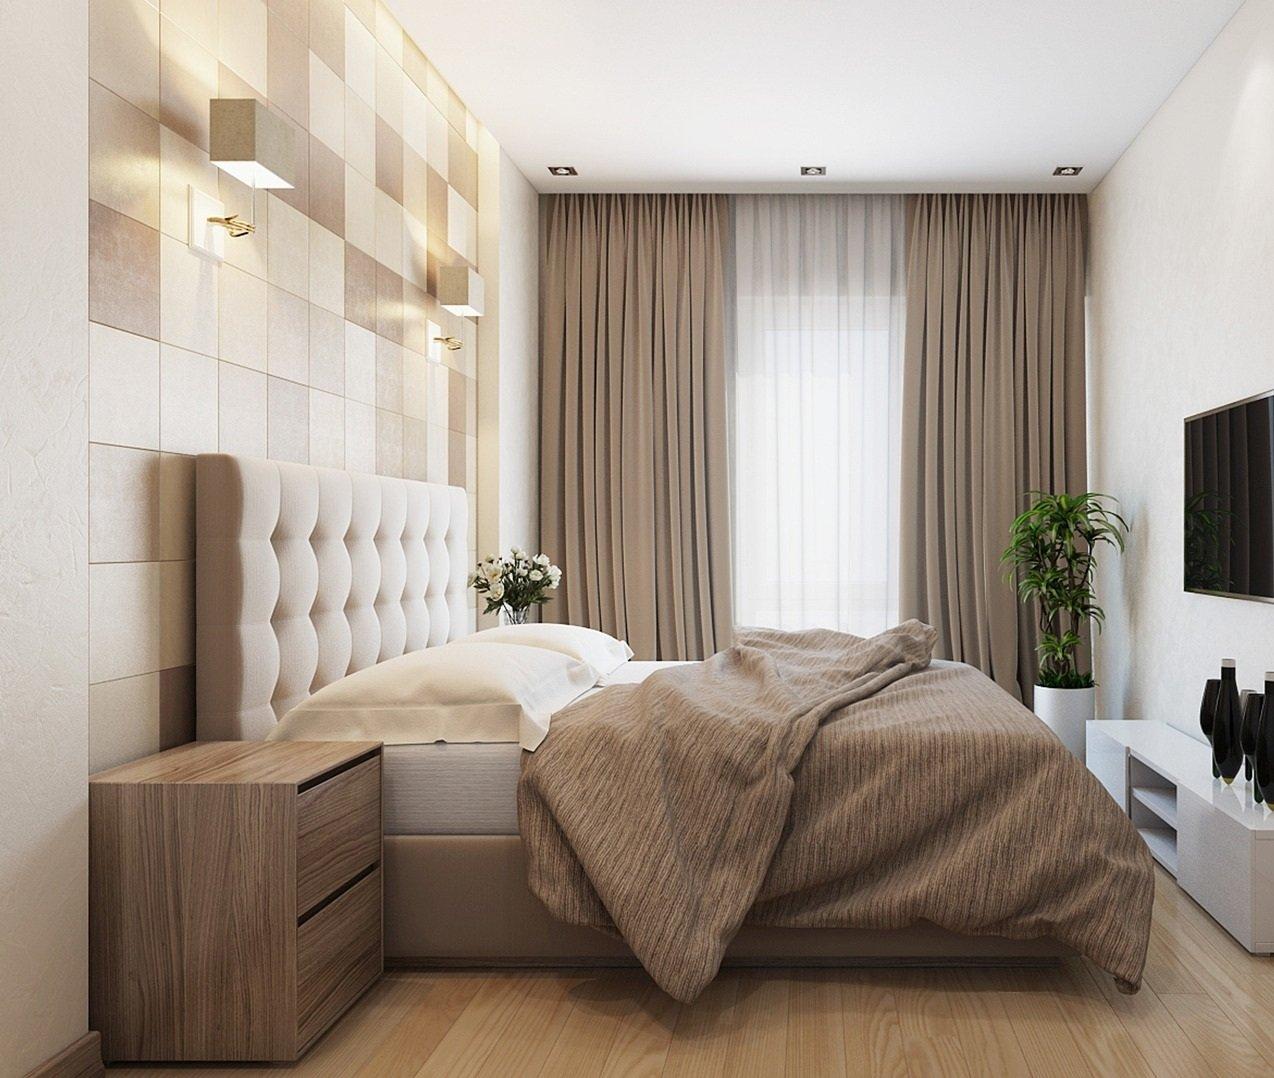 Стенка в спальню своими руками фото создан